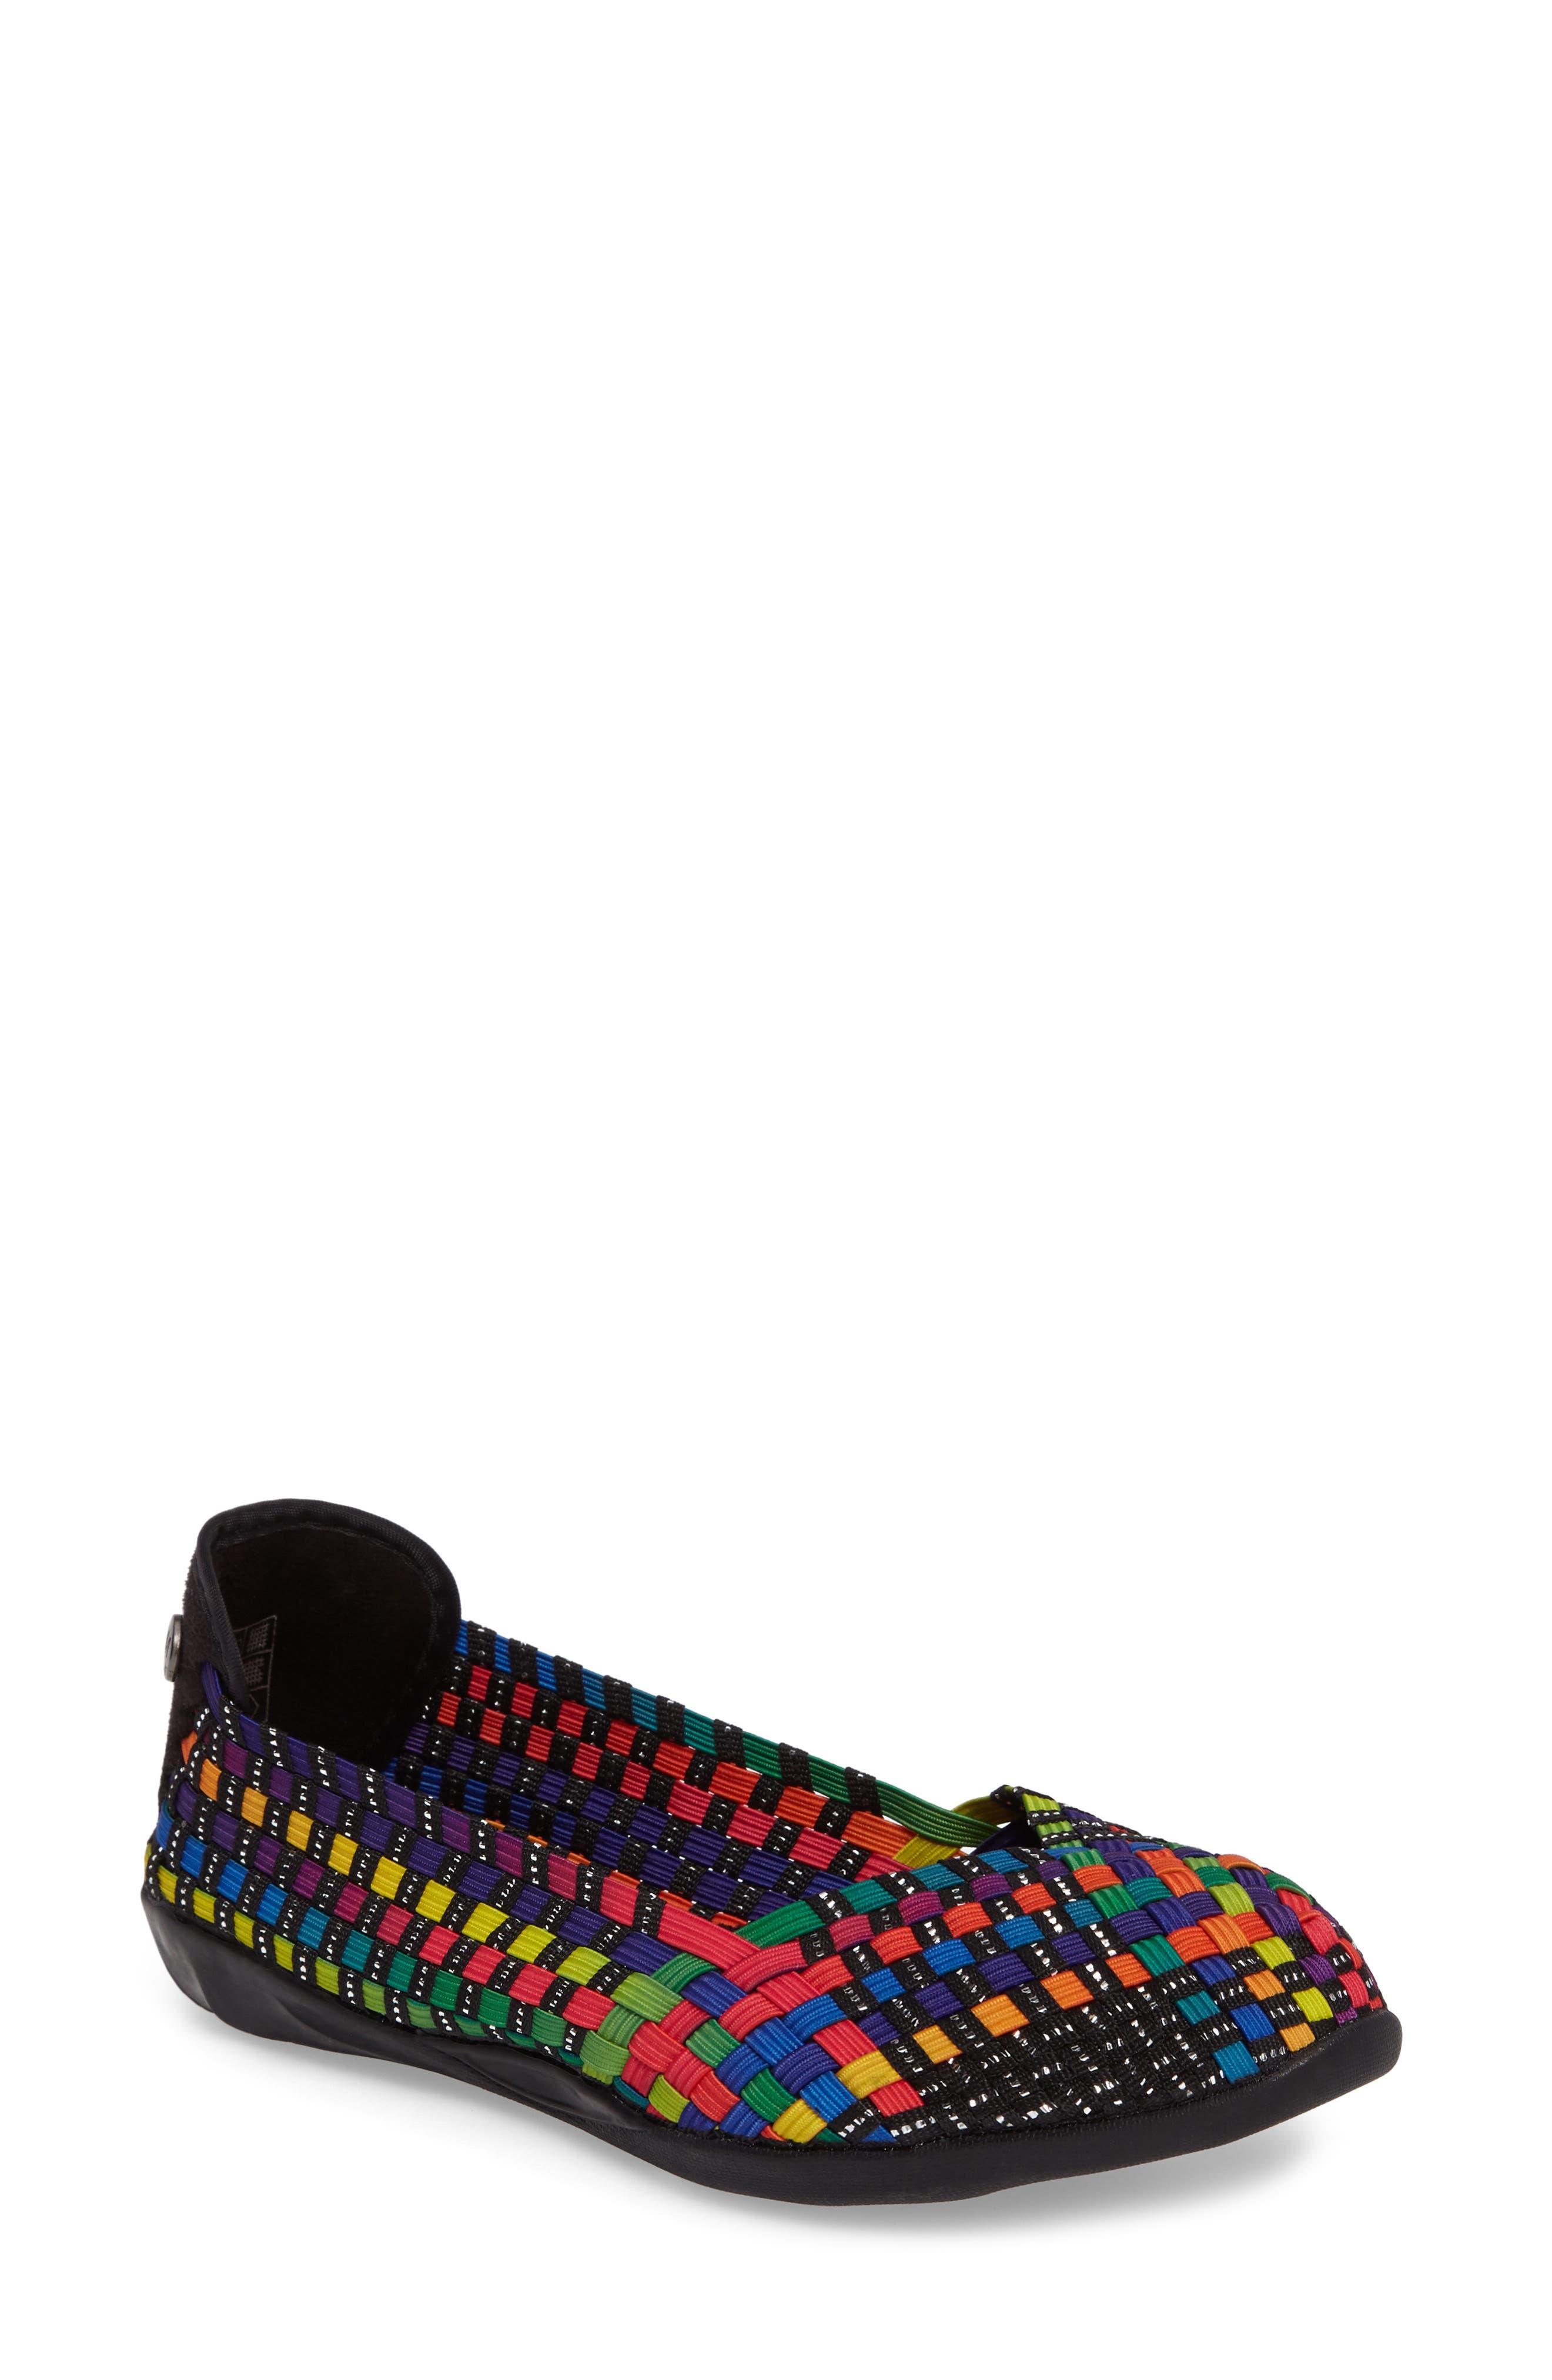 Catwalk Sneaker,                             Main thumbnail 1, color,                             Black Multi